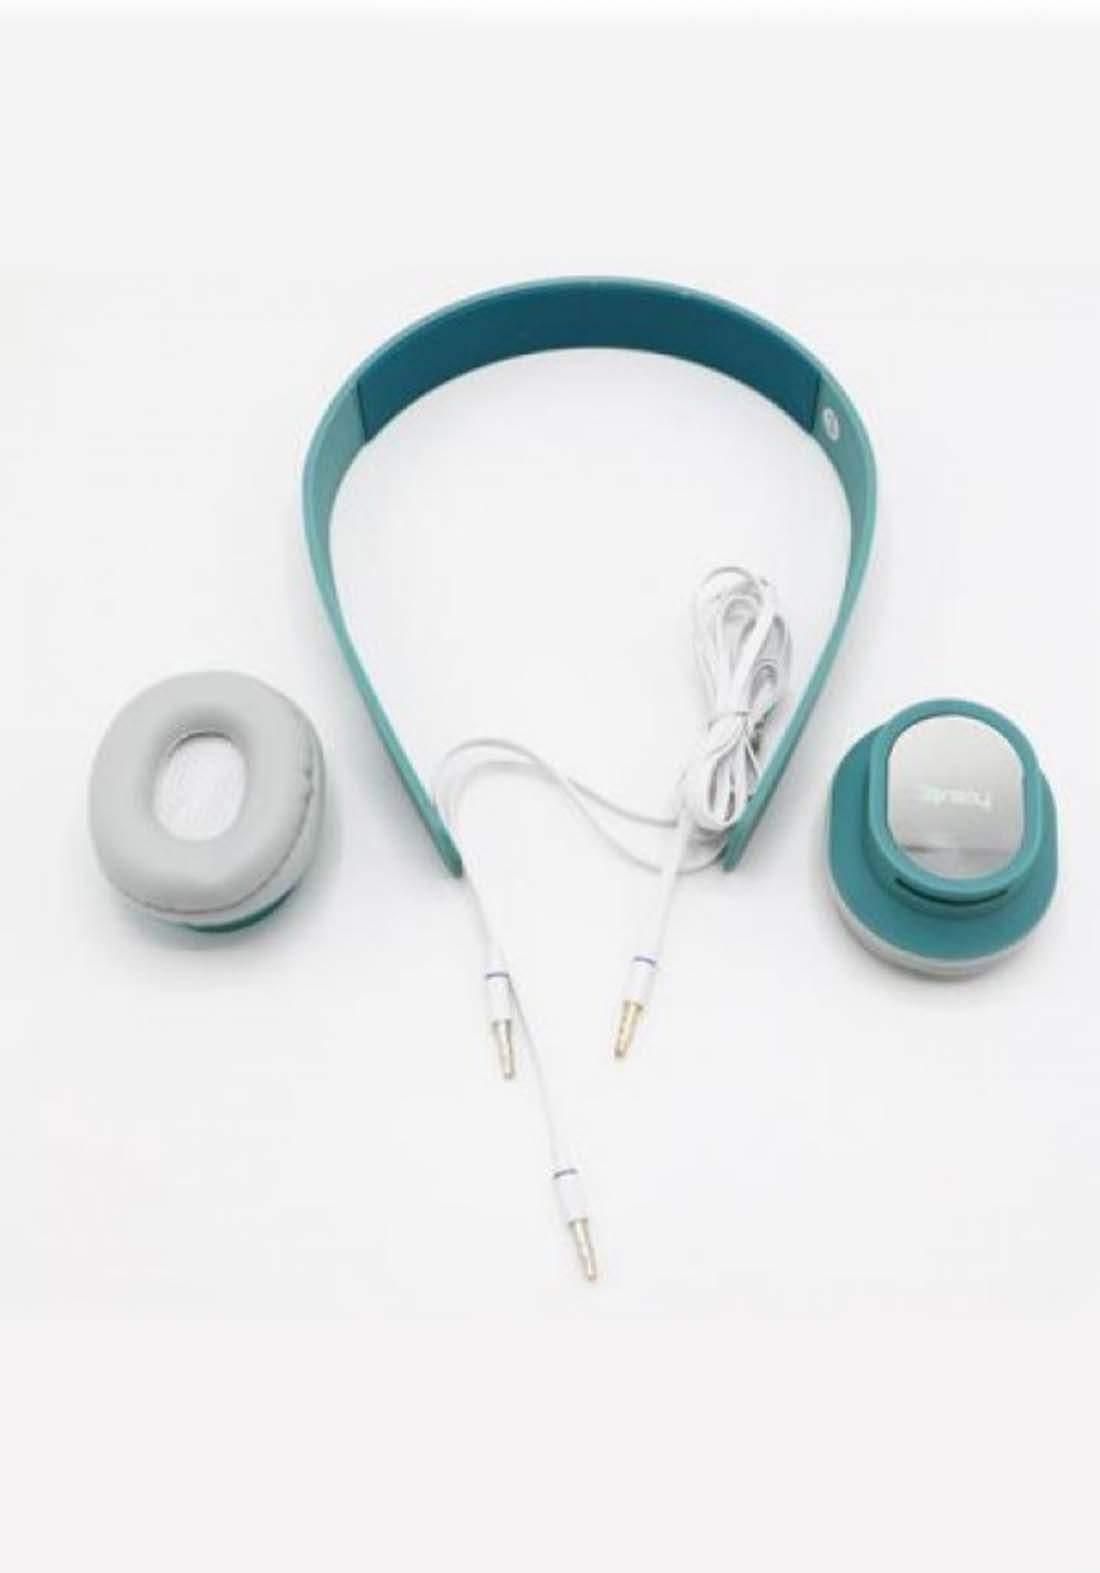 Havit 2080  Headphone  - Blue  سماعة